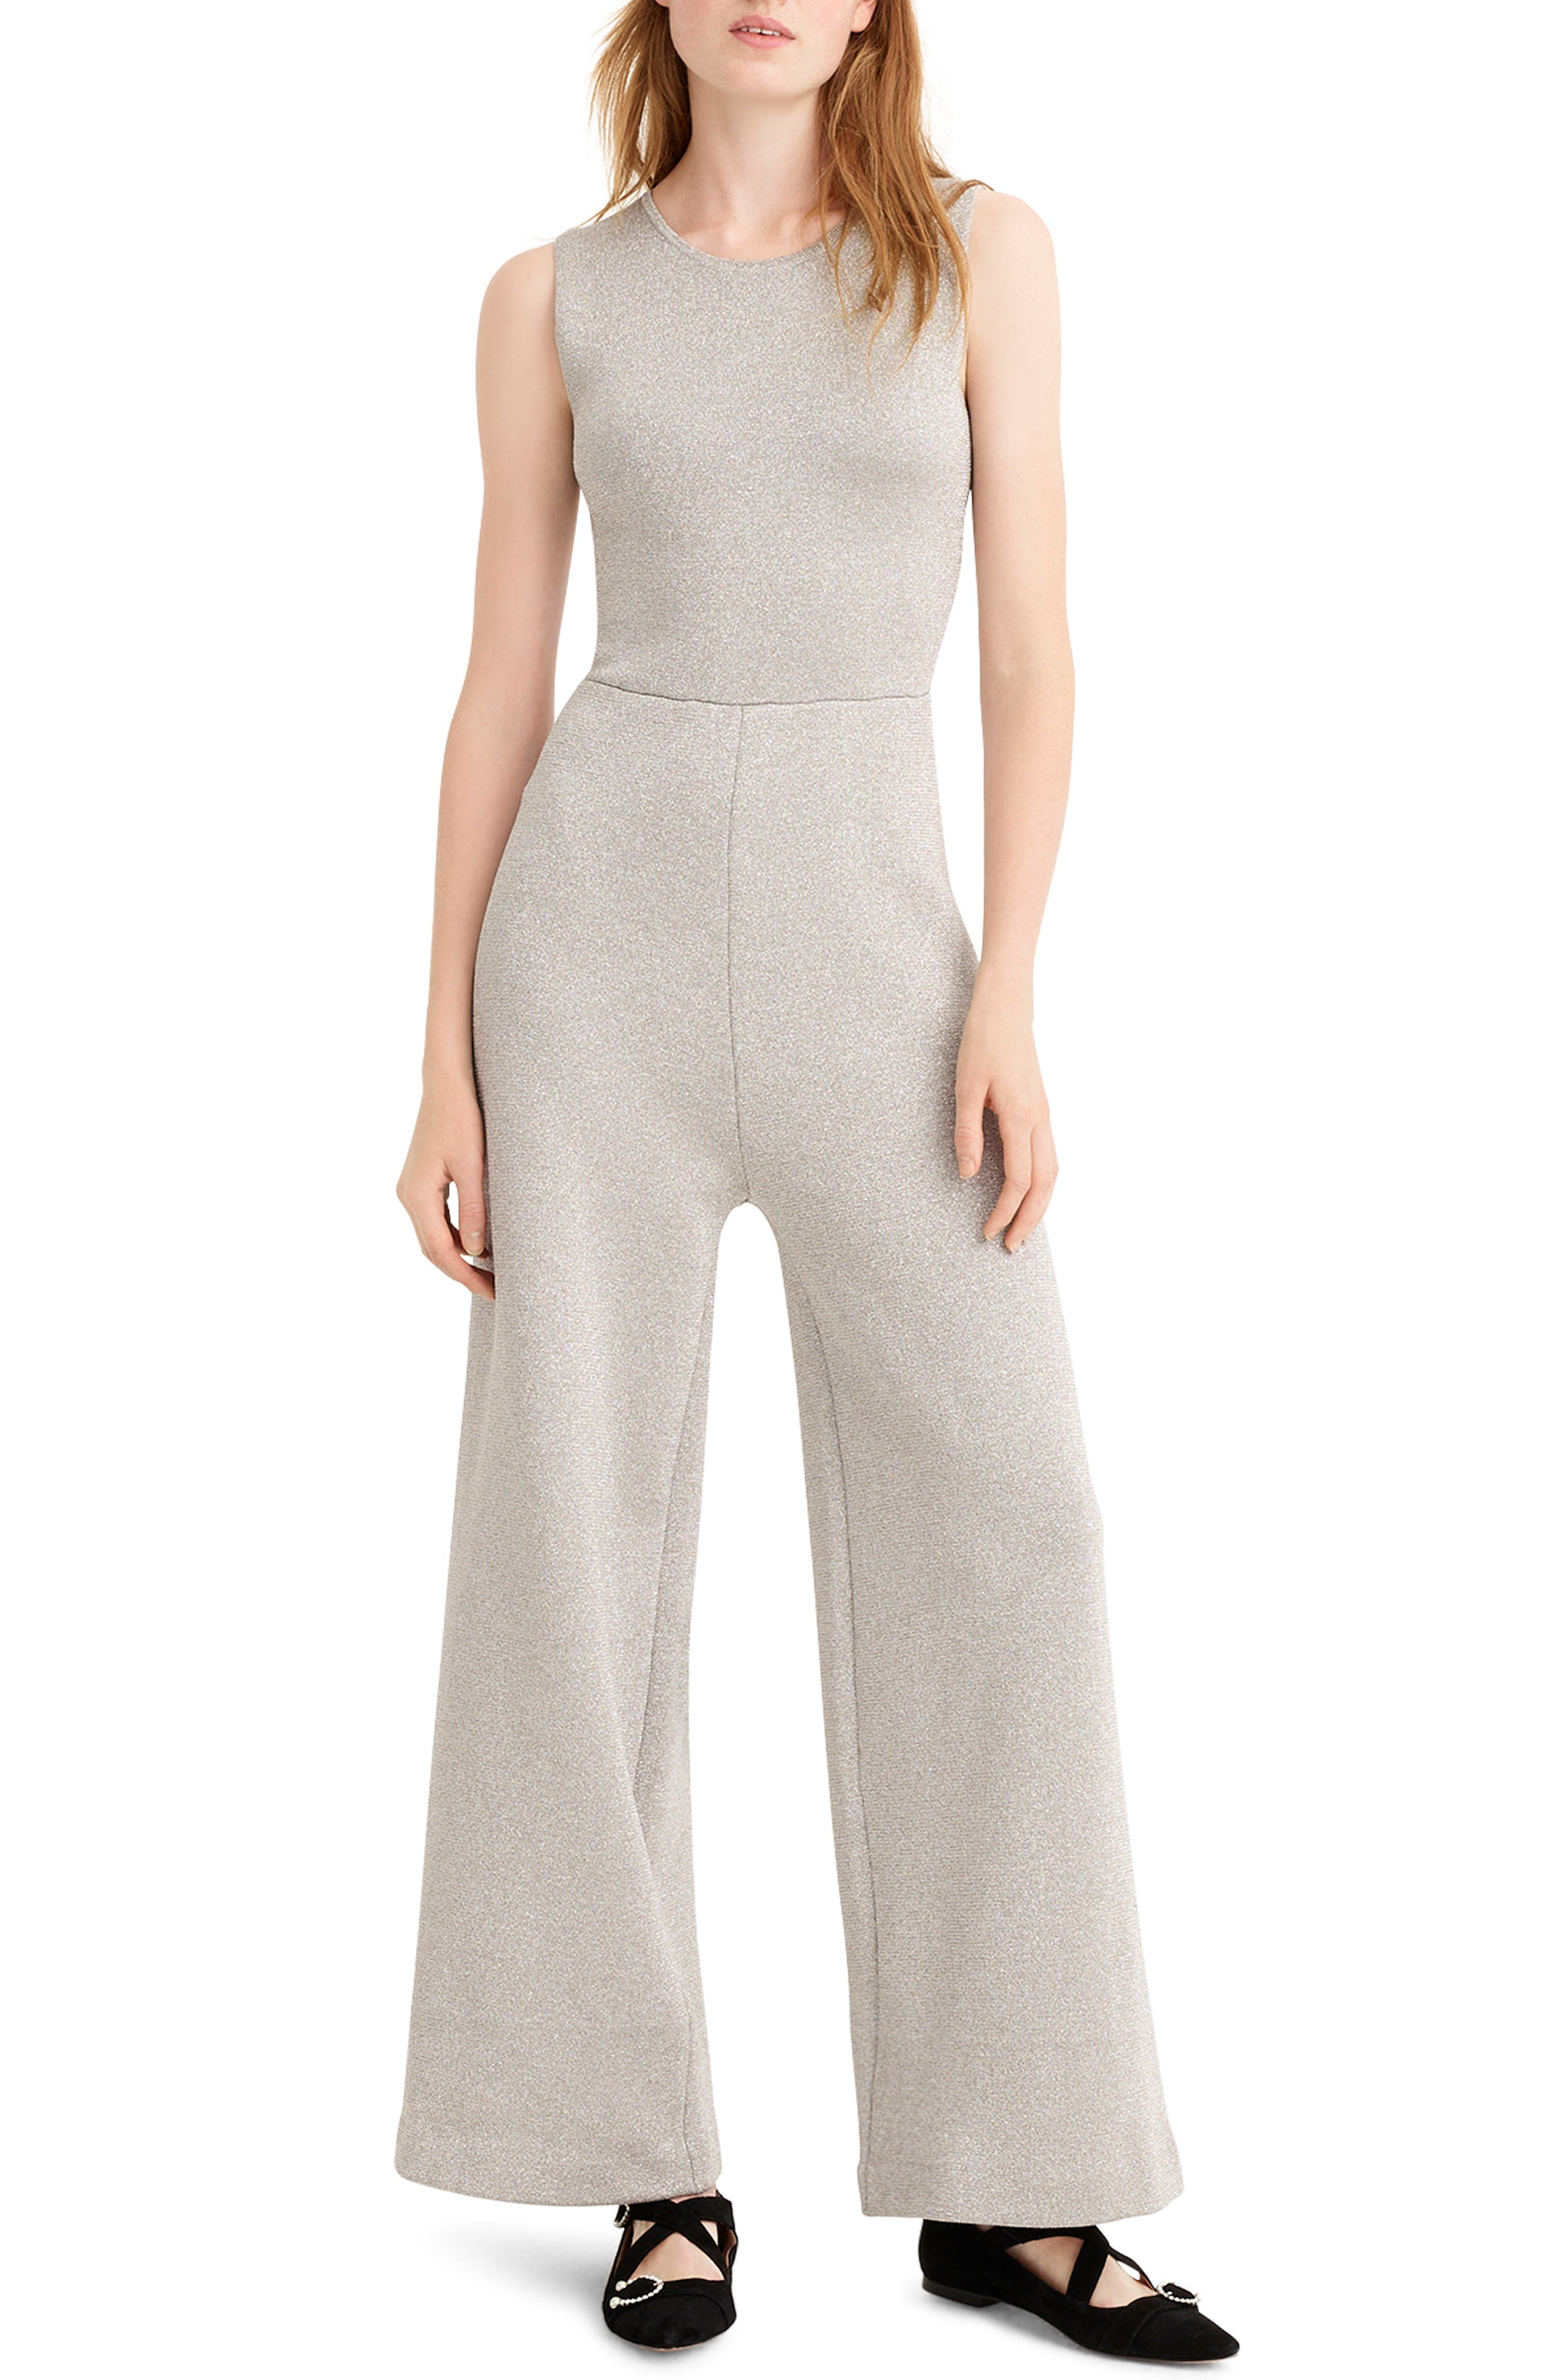 J.CREW Sleeveless Lurex Jumpsuit With Velvet Tie in Metallic